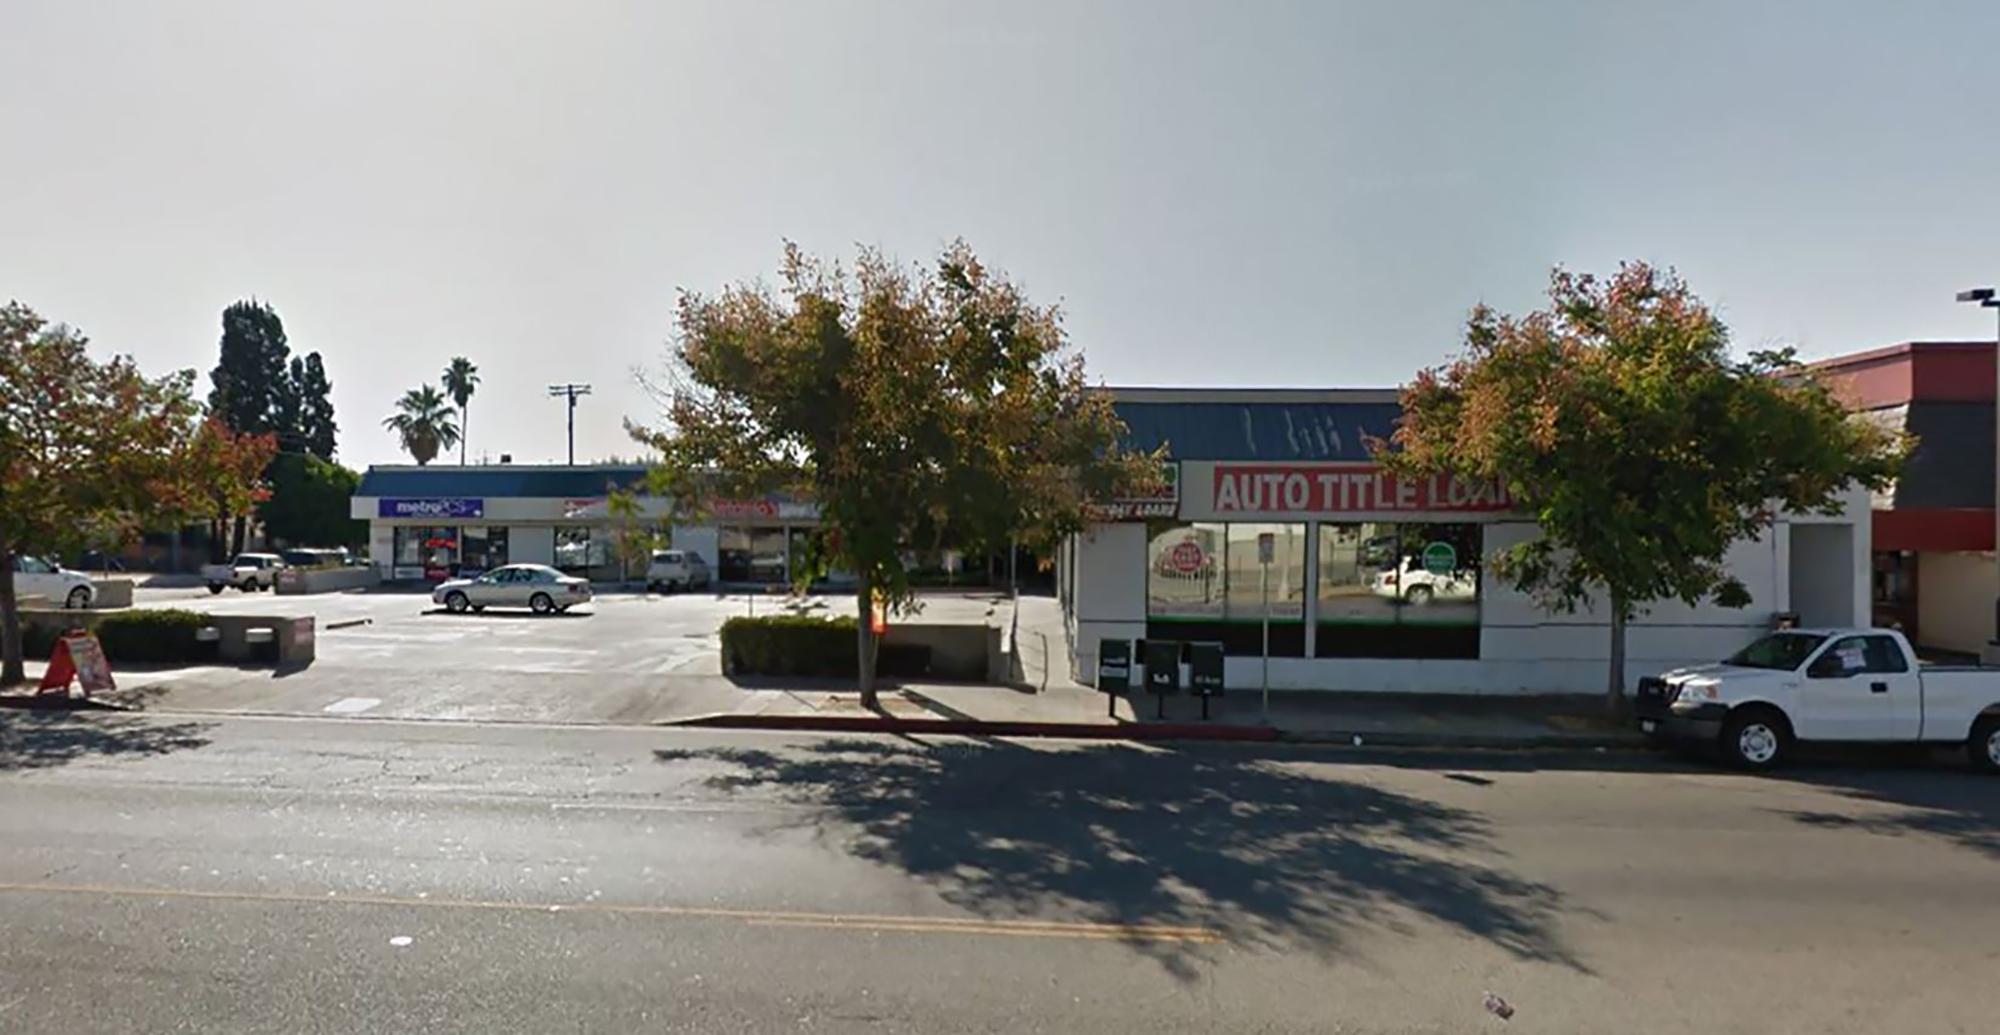 Car Title Loans Los Angeles: 13630 Van Nuys Boulevard Car Title Loans In Los Angles, CA